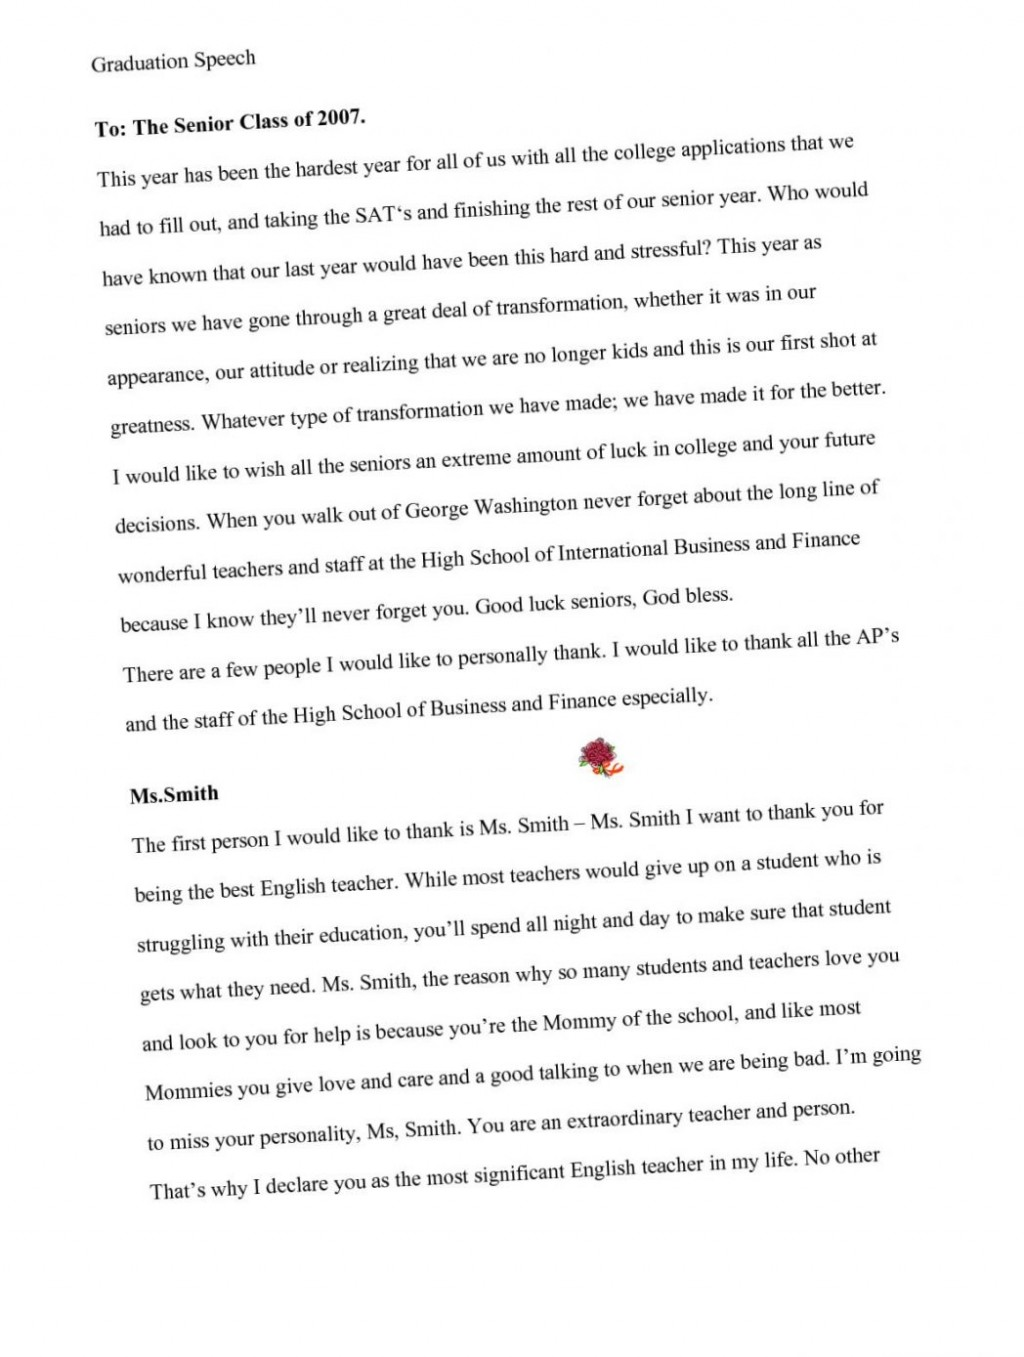 015 Starting Business Essay Graduating High School Wwwgxartorg Writing Service 1048x1389 Example Rare Graduation Day Ceremony Large